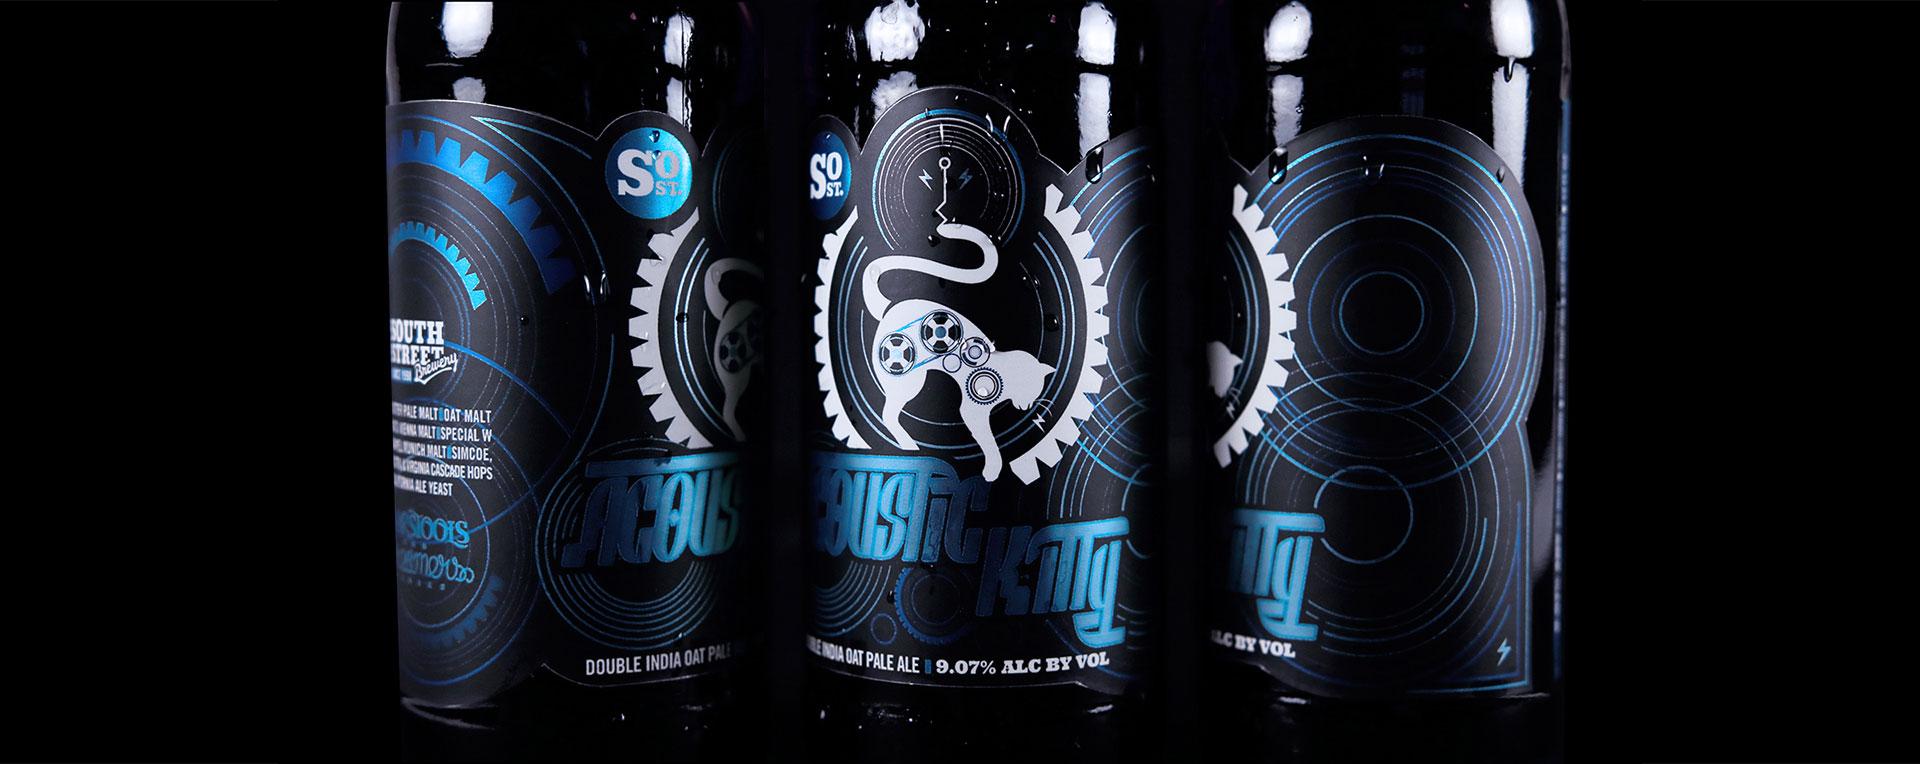 827-south-street-brew-3